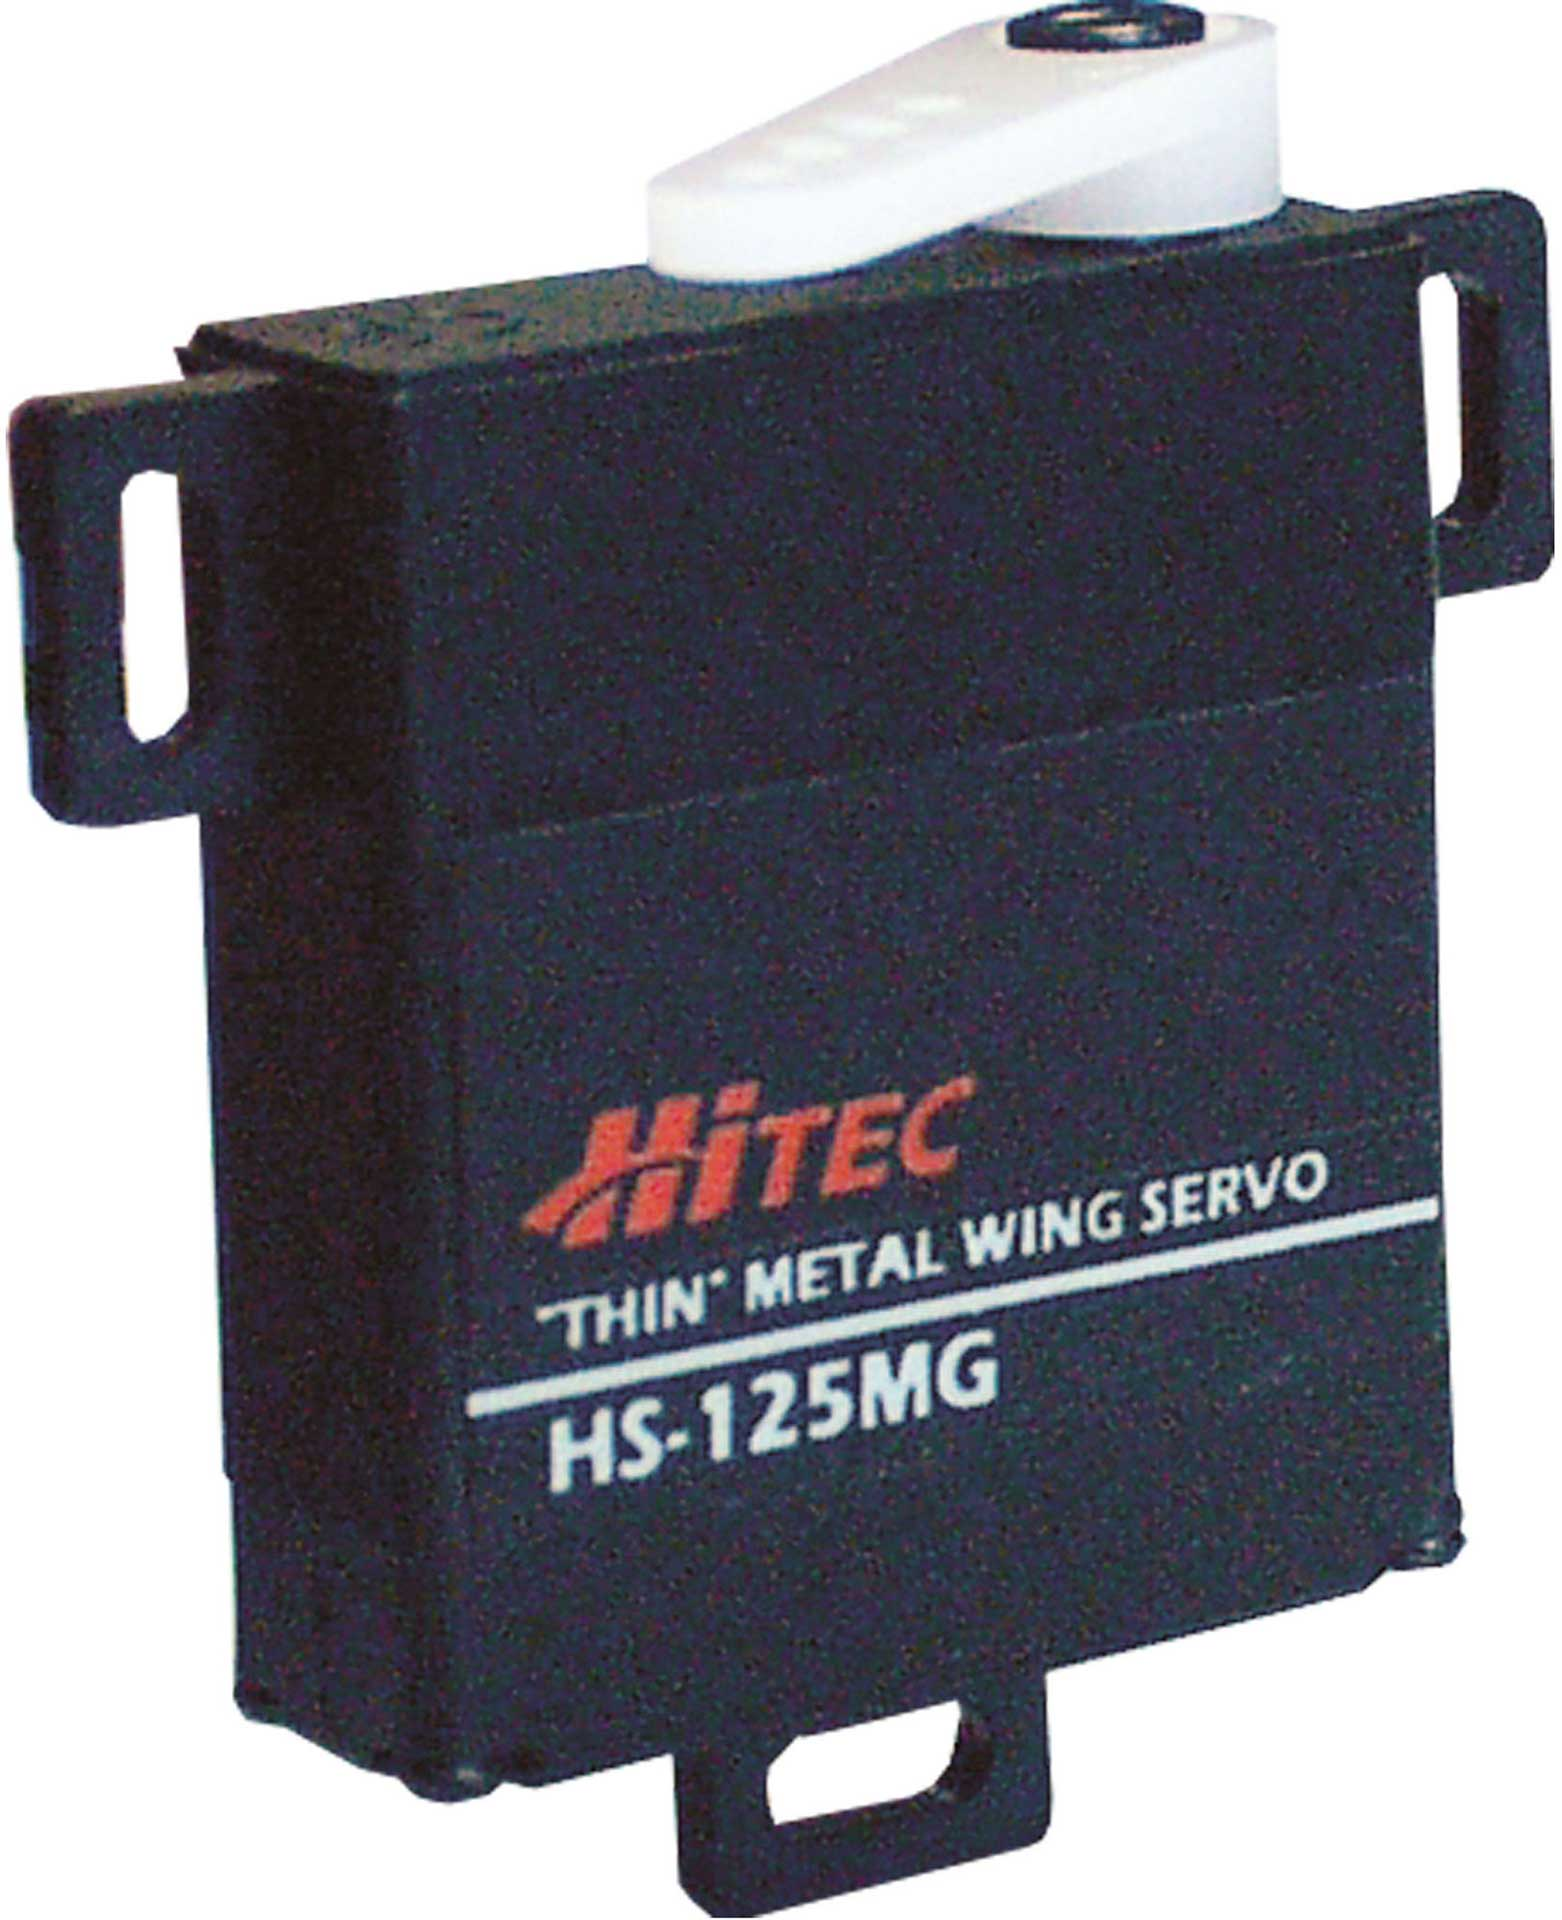 HITEC HS-125 BB/MG SERVO UNI